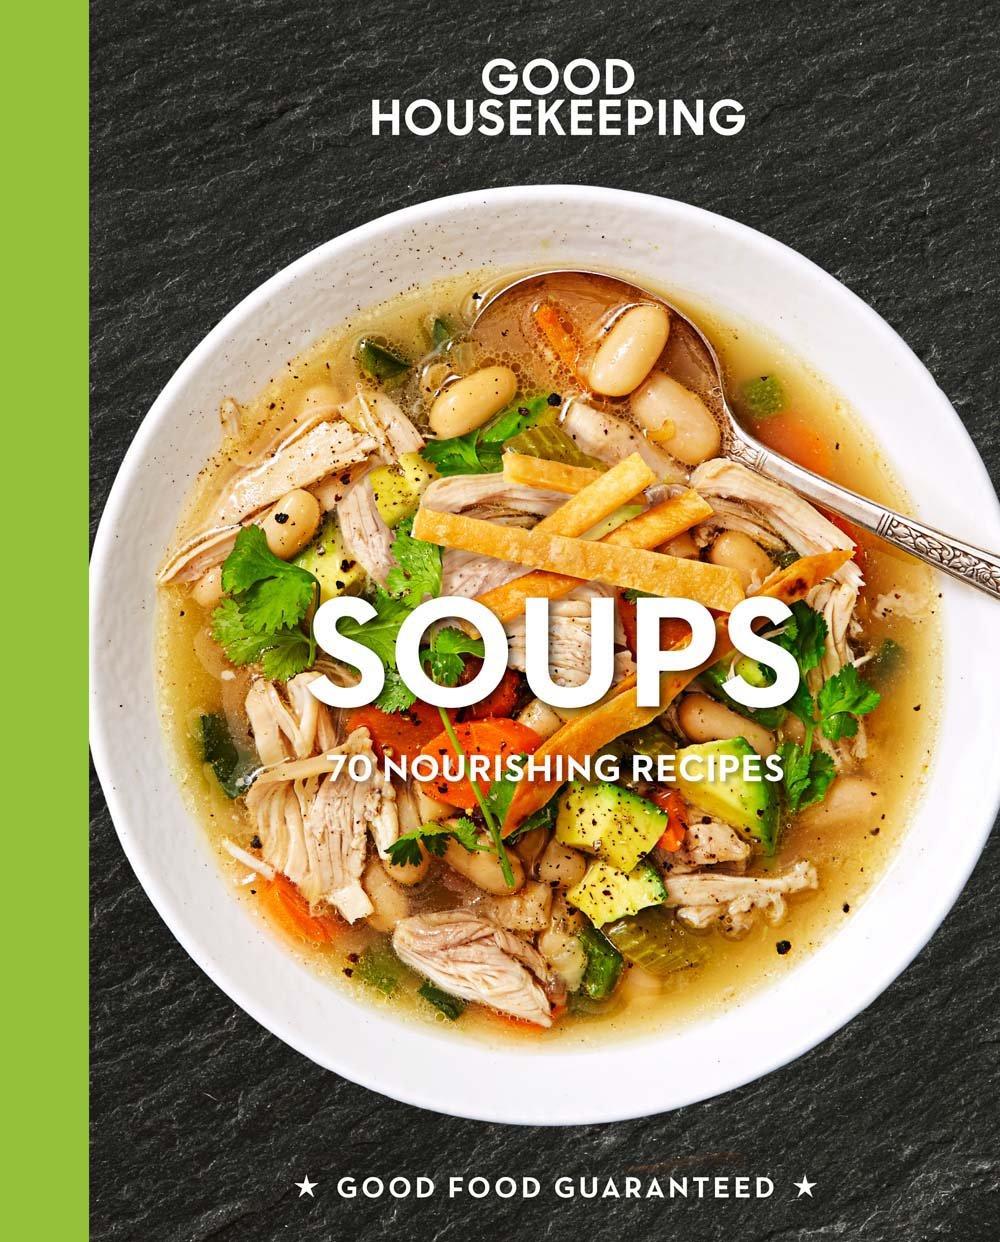 Good Housekeeping Soups: 70+ Nourishing Recipes (Good Food Guaranteed) pdf